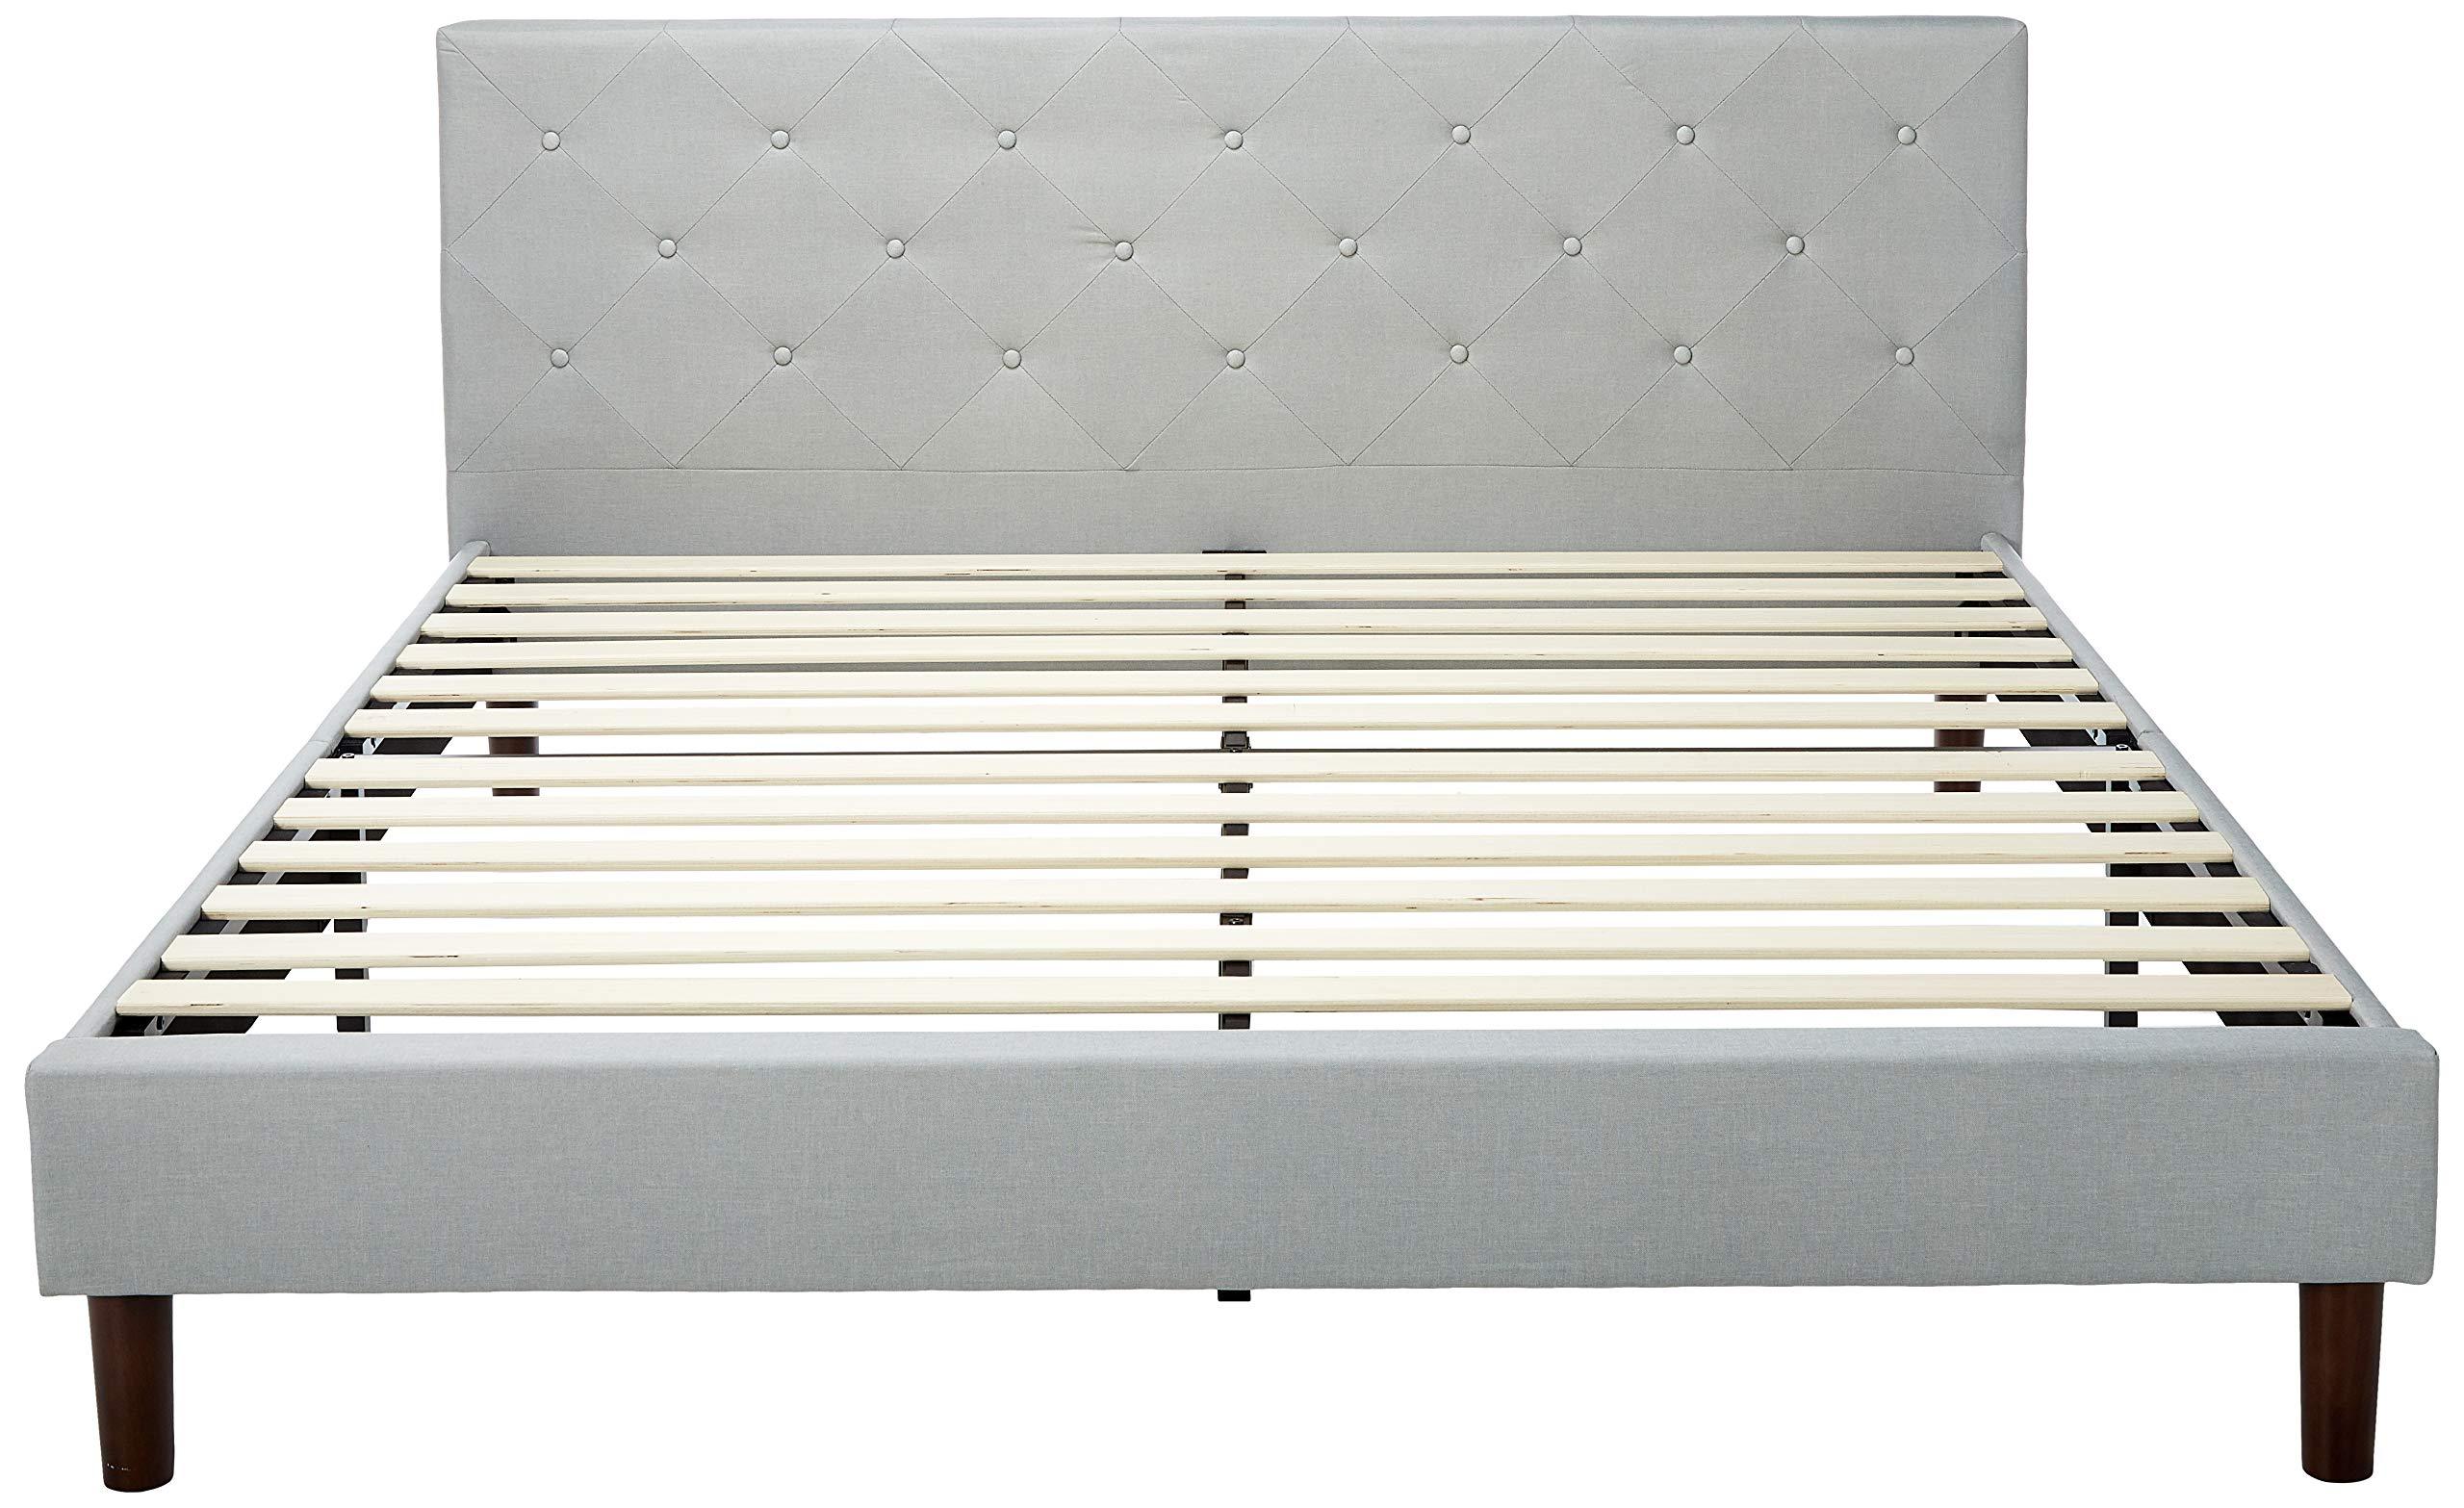 ZINUS Shalini Upholstered Platform Bed Frame with ZINUS 10 Inch Memory Foam Spring Hybrid Mattress